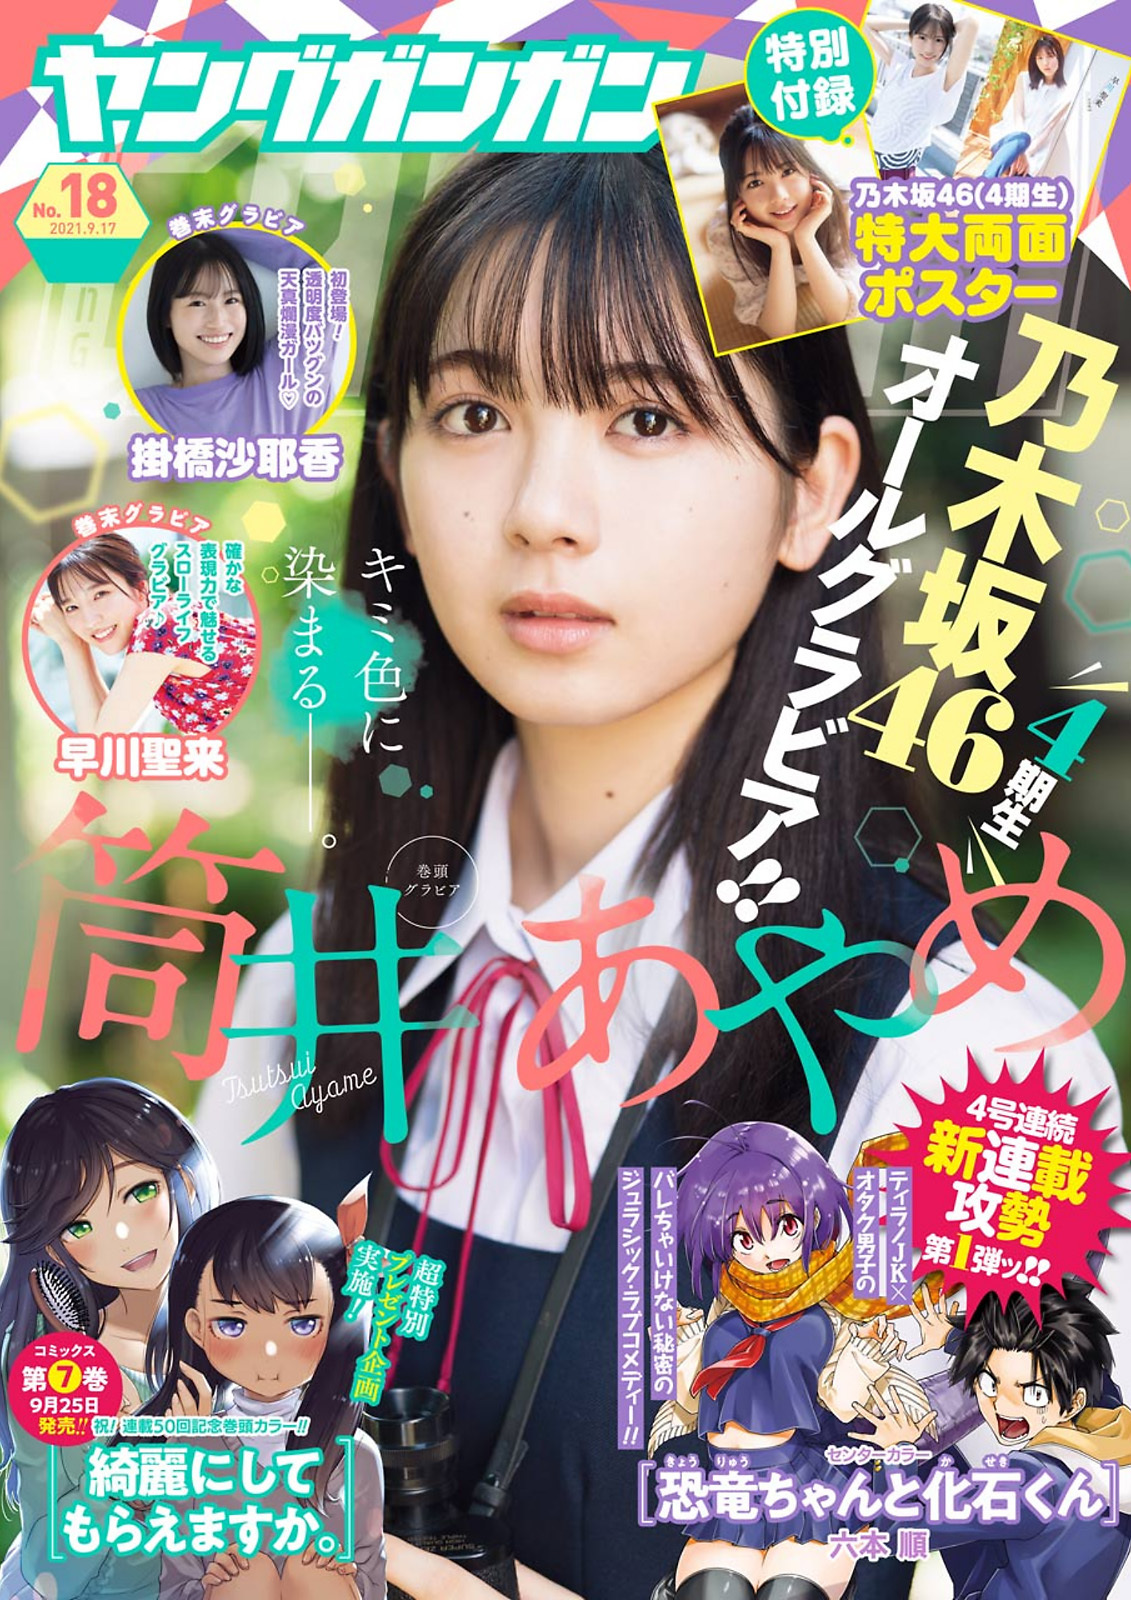 [Young Gangan] 2021 No.18 (筒井あやめ 掛橋沙耶香 早川聖来)